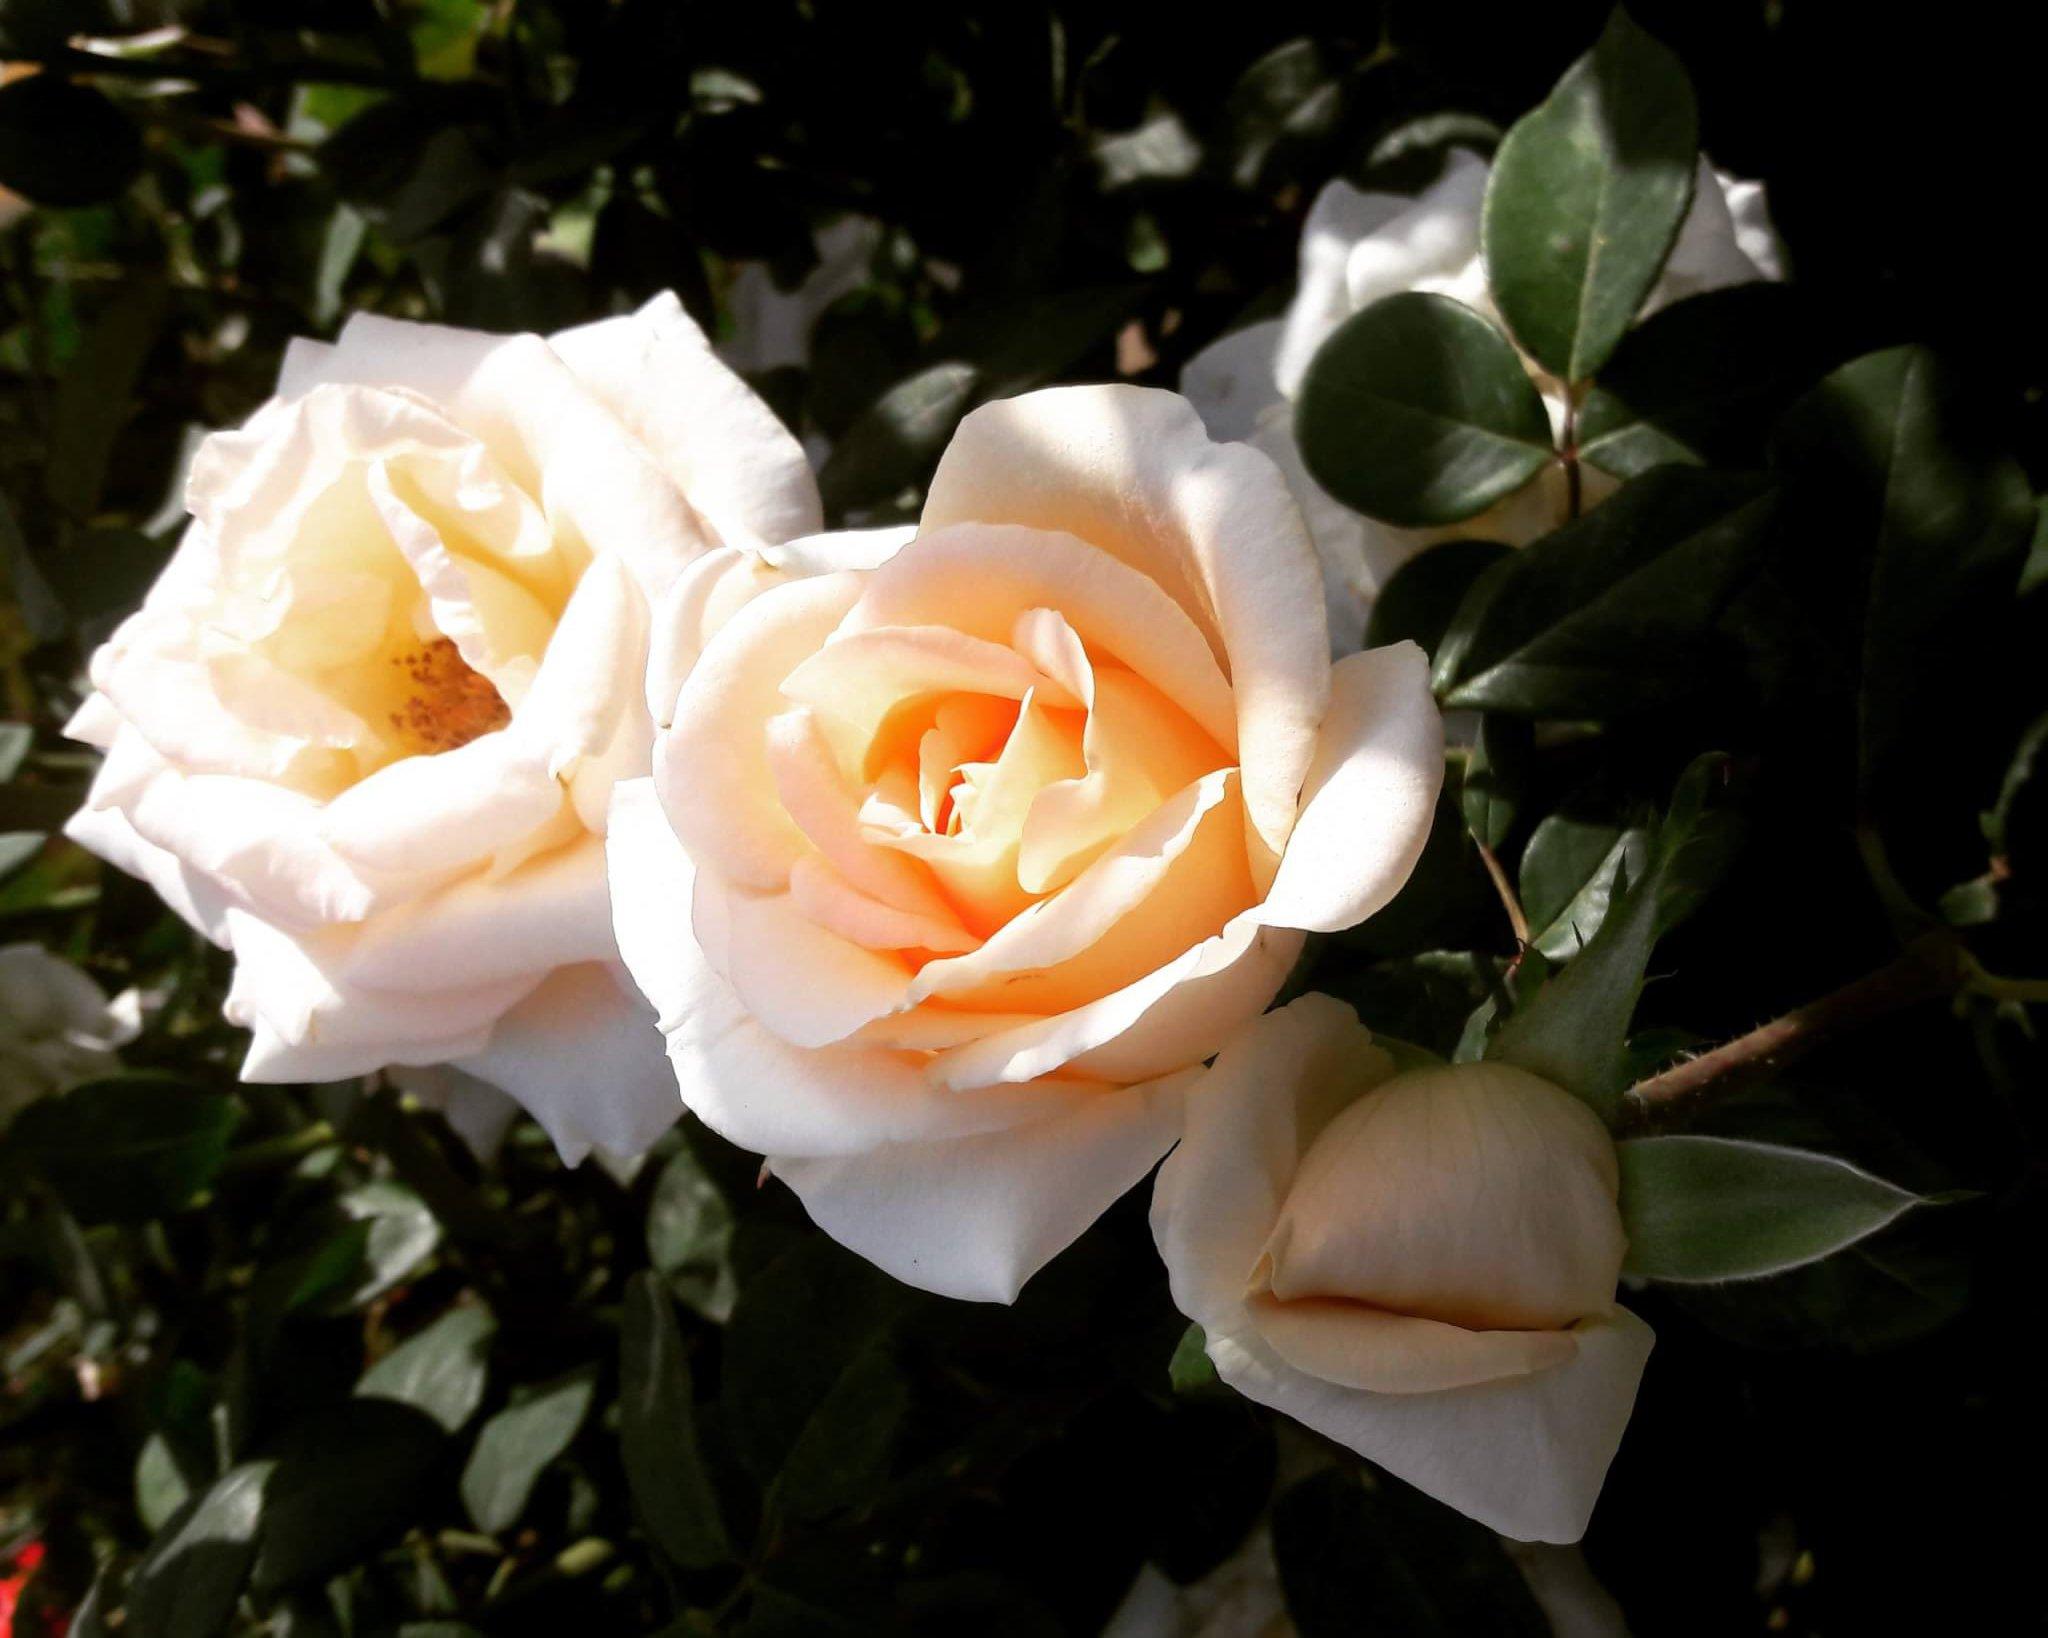 Info Shymkent - Happy Women's Day